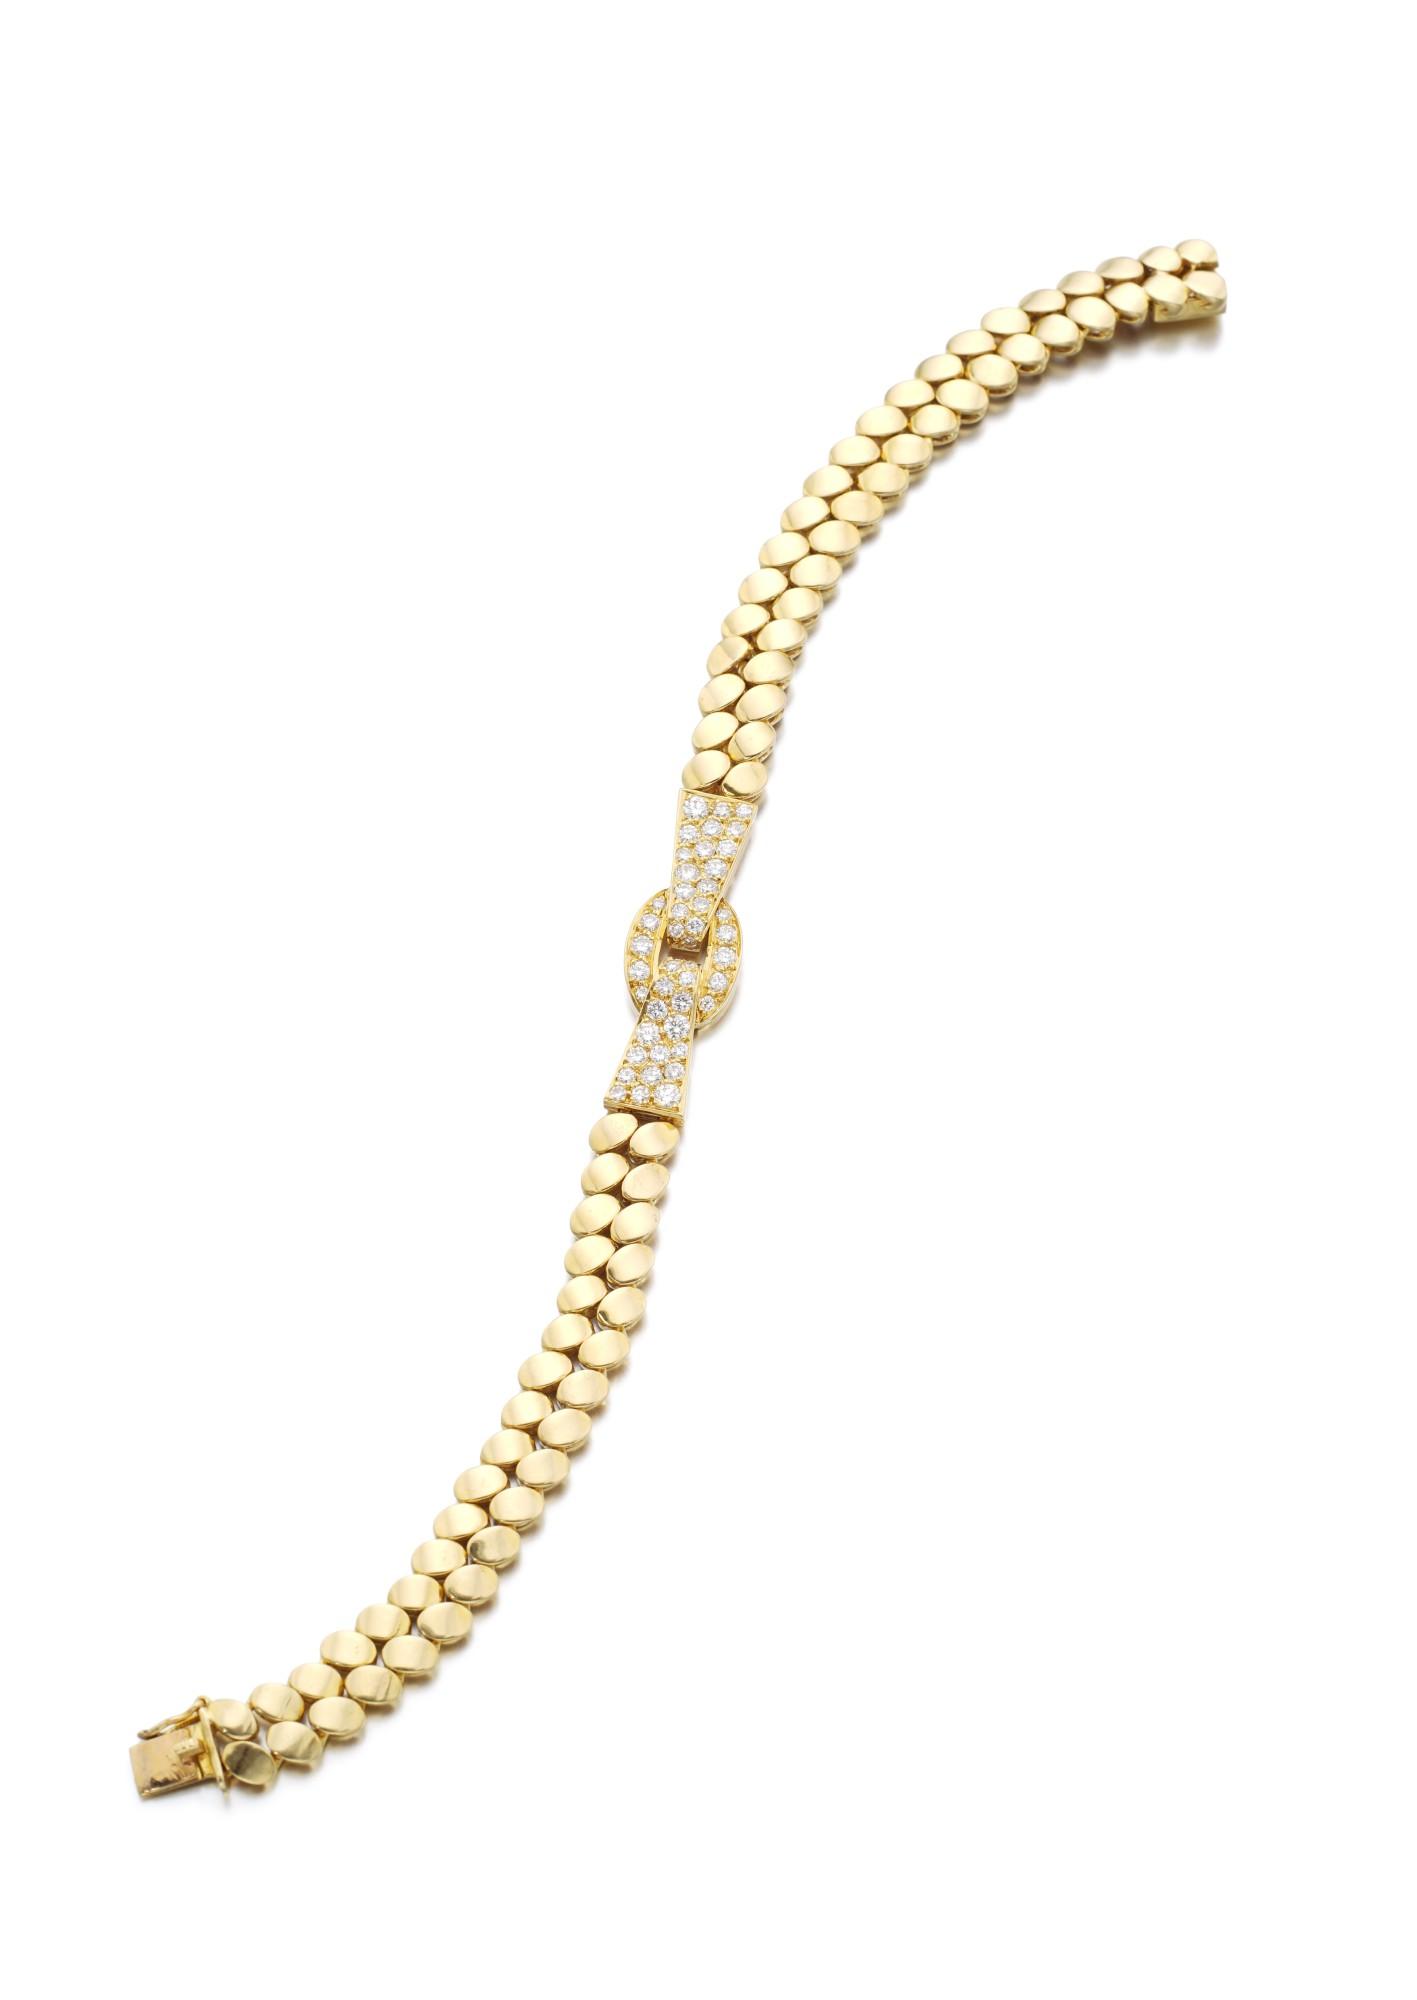 GOLD AND DIAMOND BRACELET | VAN CLEEF & ARPELS